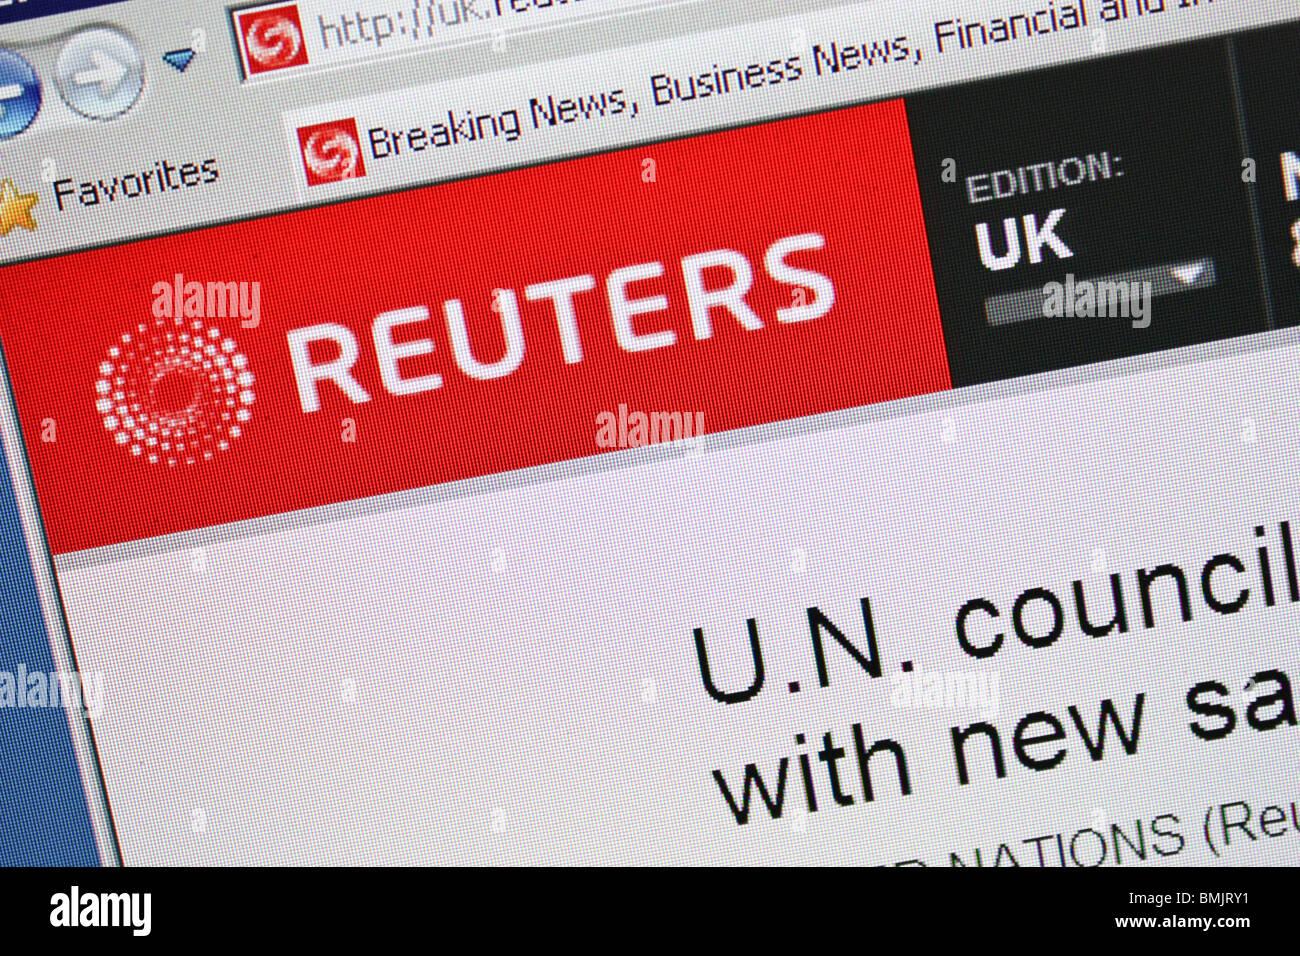 reuters uk online website global markets news - Stock Image